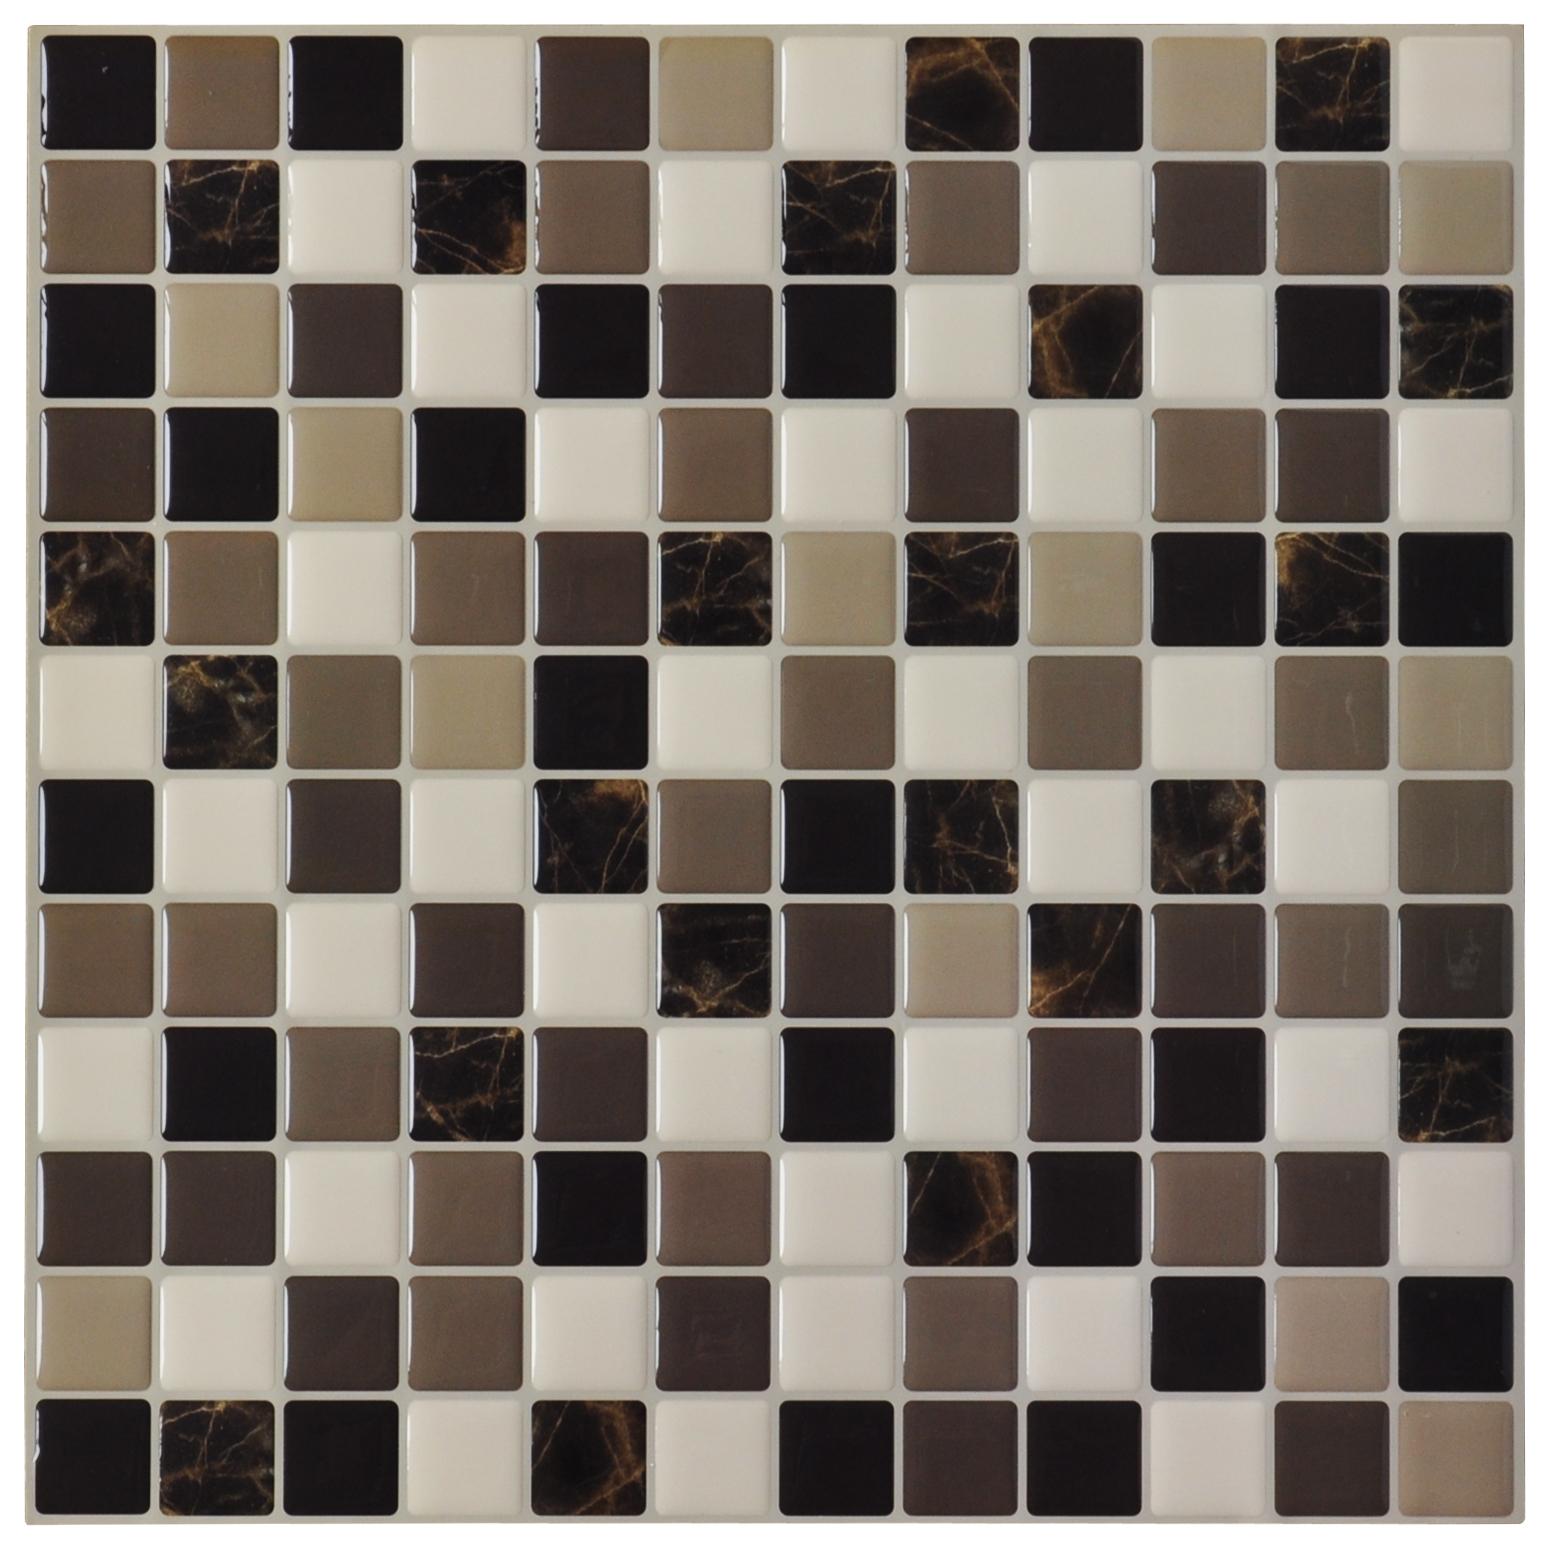 DIY Vinyl Tile Backsplash Adhesive Wall Covering for Kitchen, Bathroom 6 Tiles 5.8 Sq.Ft